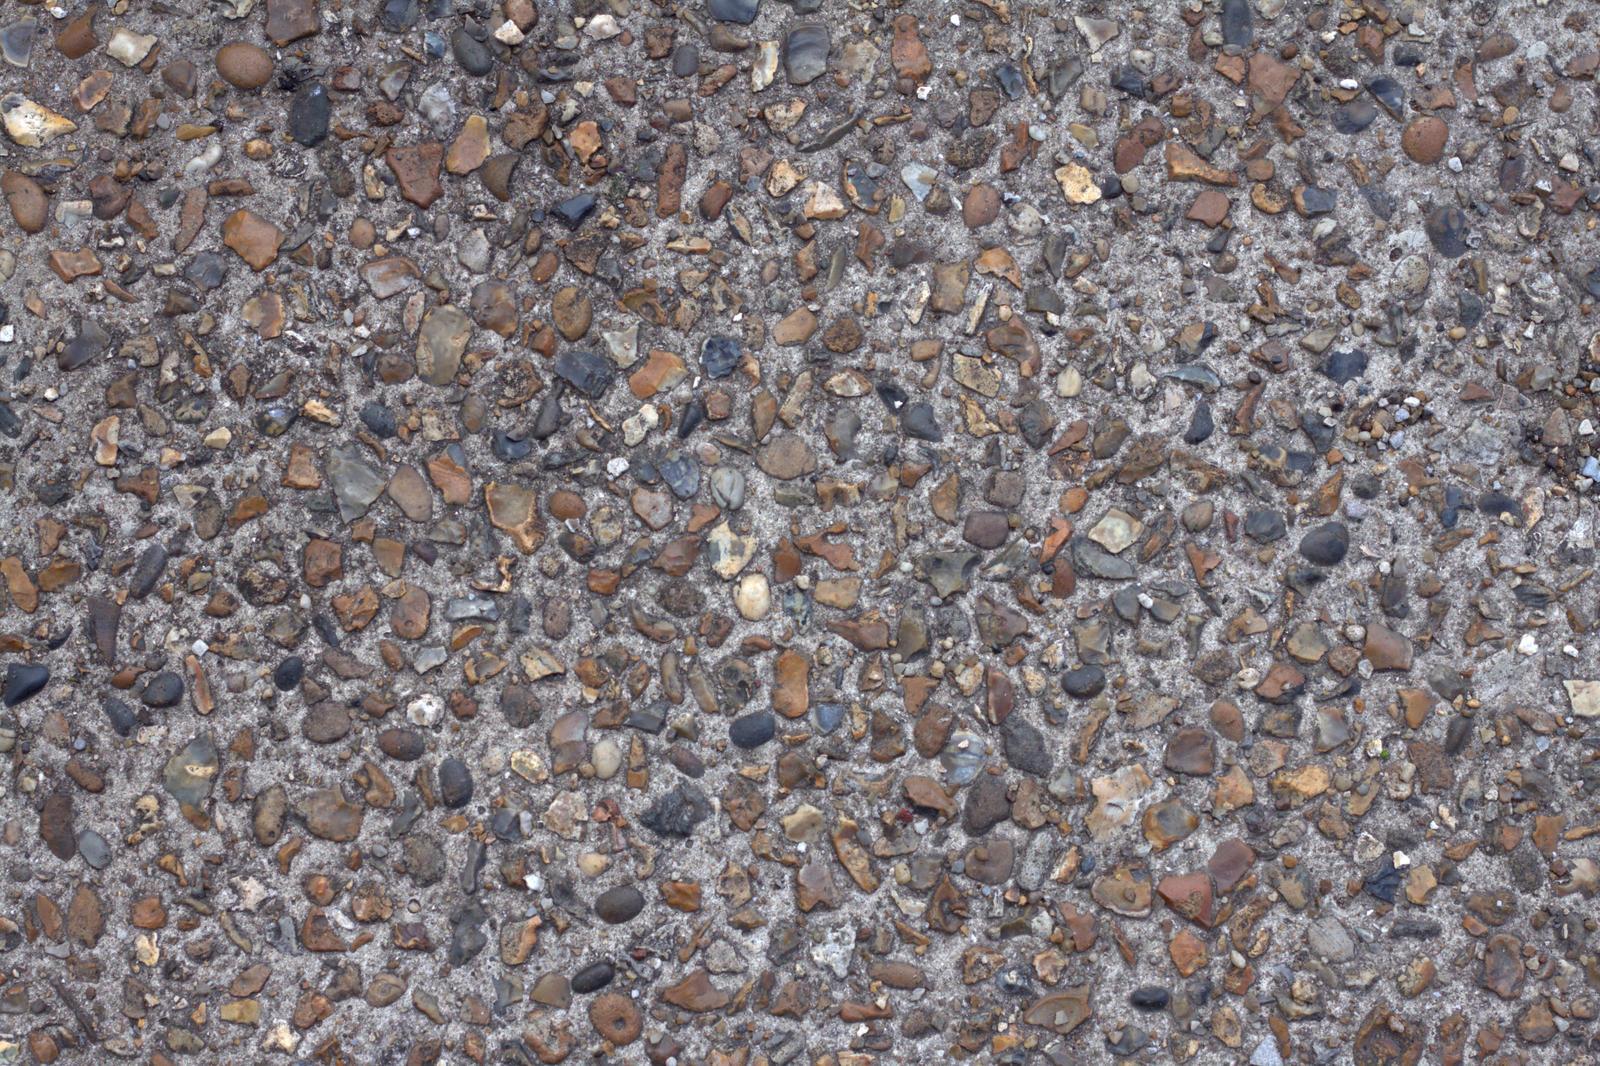 Concrete Cobble Pebble Stone Walkway Pathway T By Hhh316